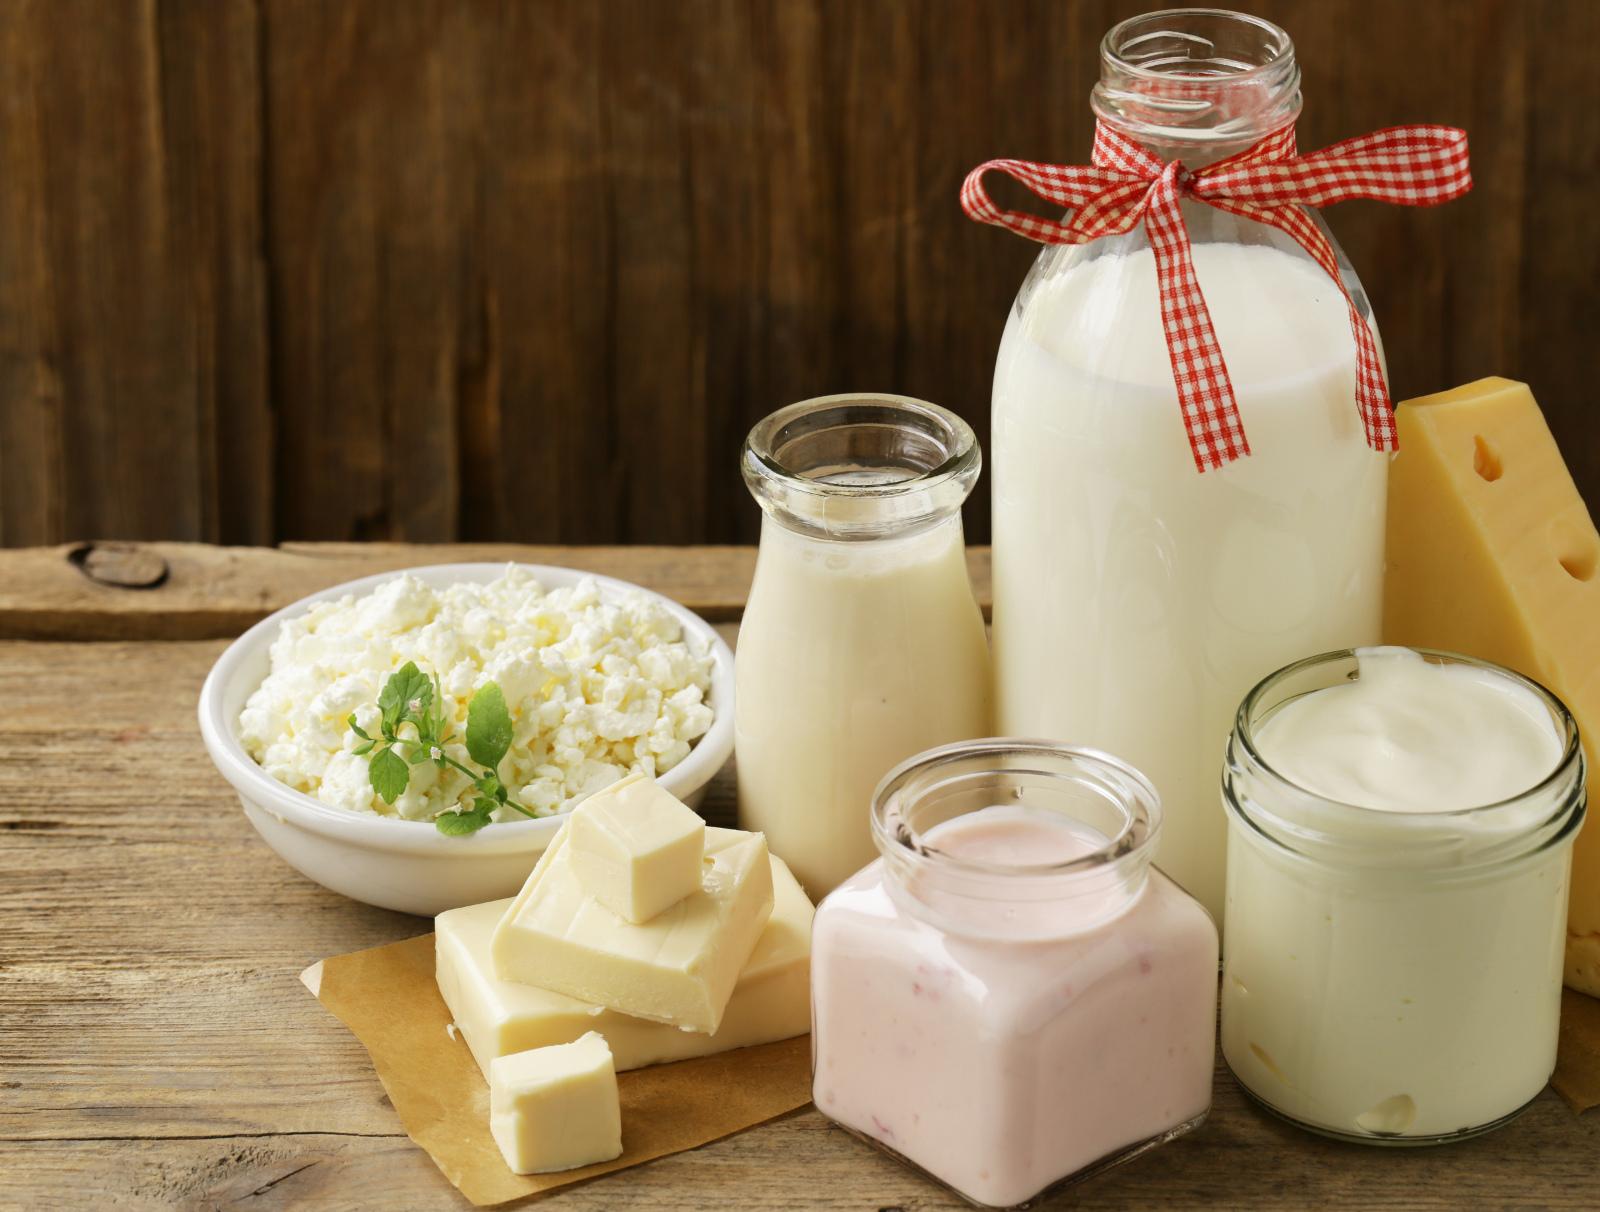 organic dairy products - milk, sour cream, cottage cheese, yogurt